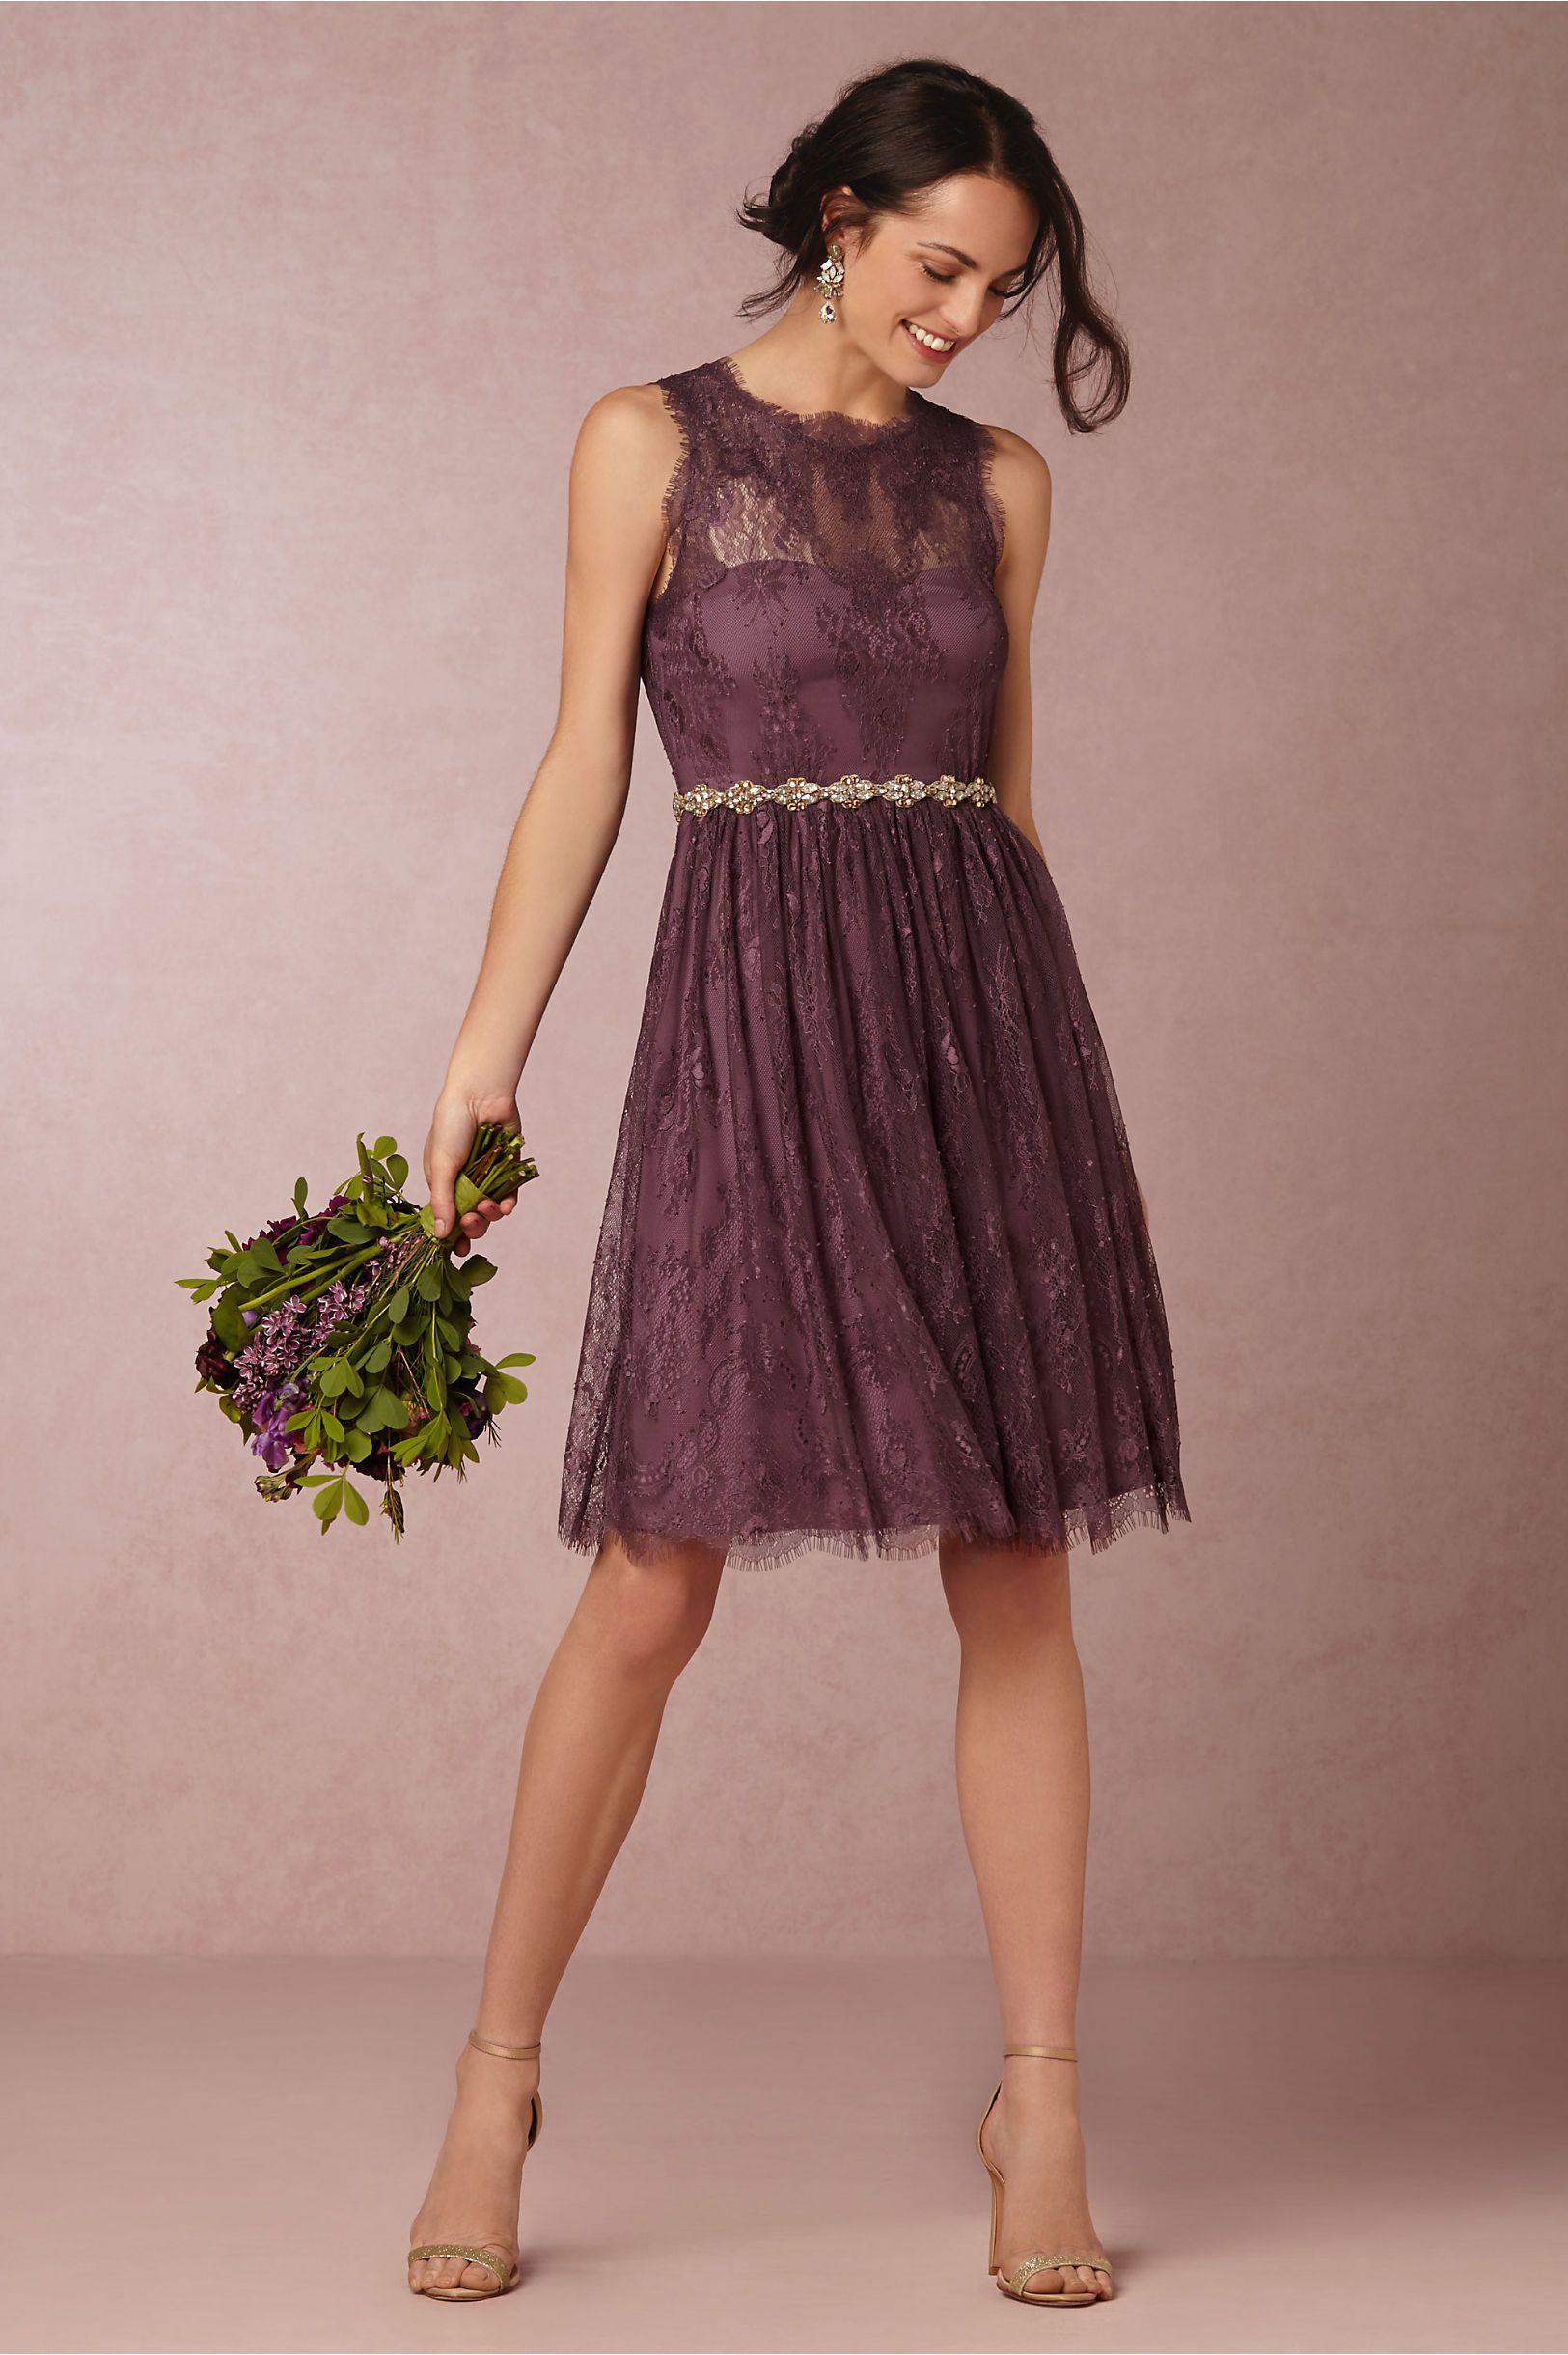 BHLDN Celia Dress in Bridesmaids Bridesmaid Dresses at ...